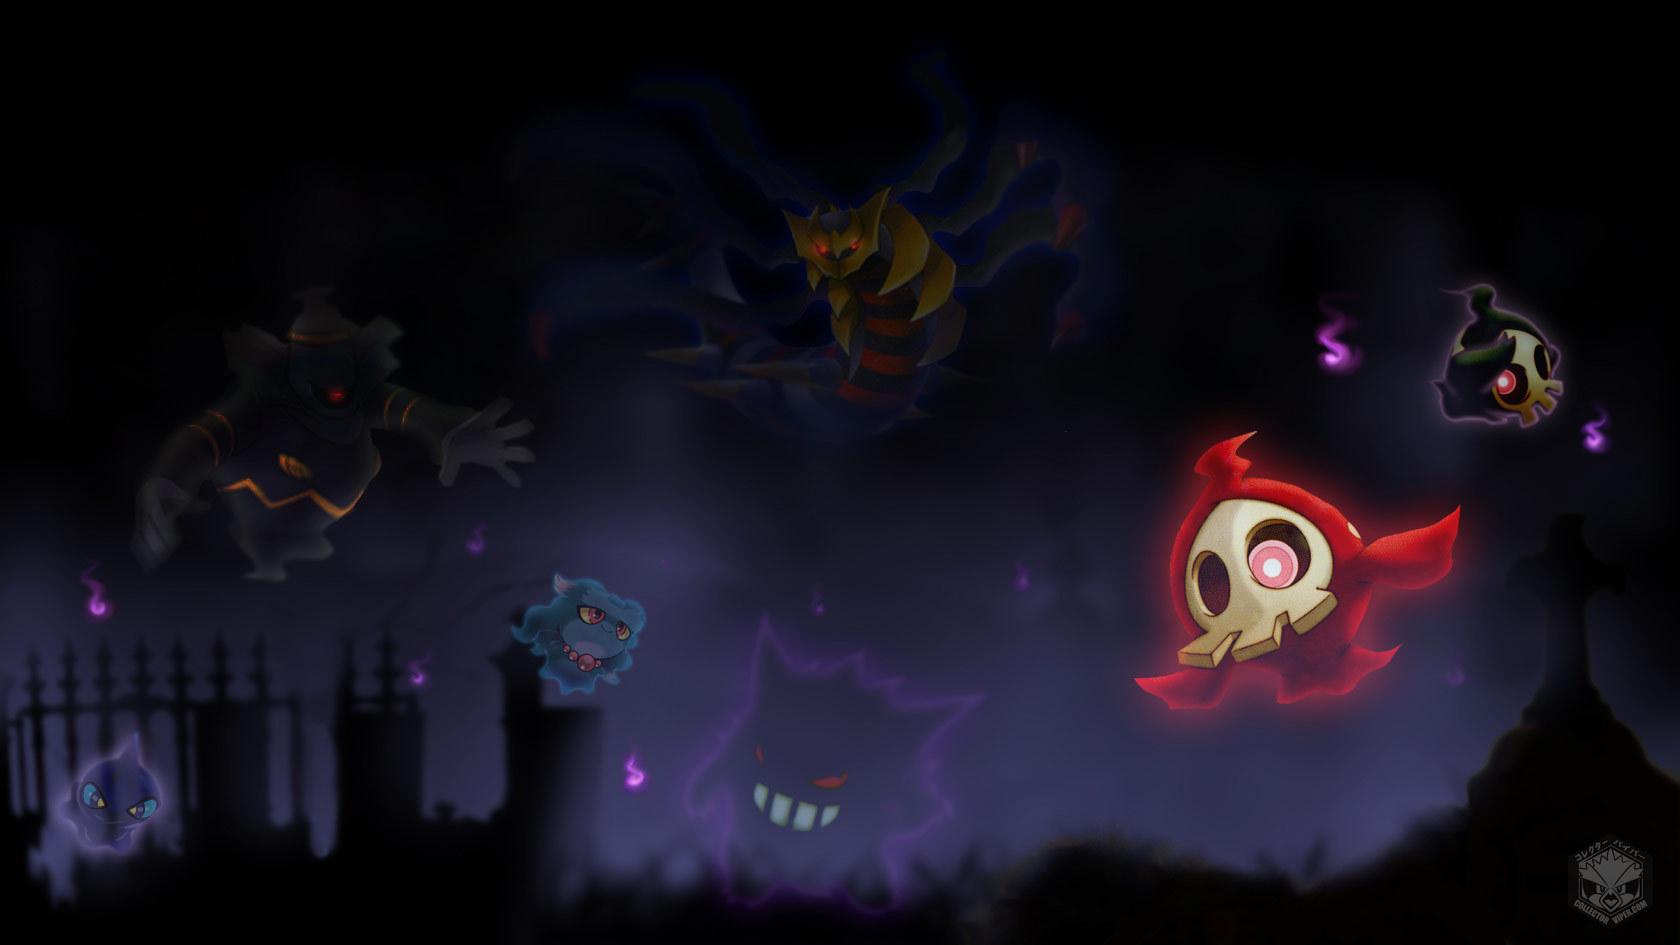 Pokemon pokemon 22620687 1680 945jpg 1680x945